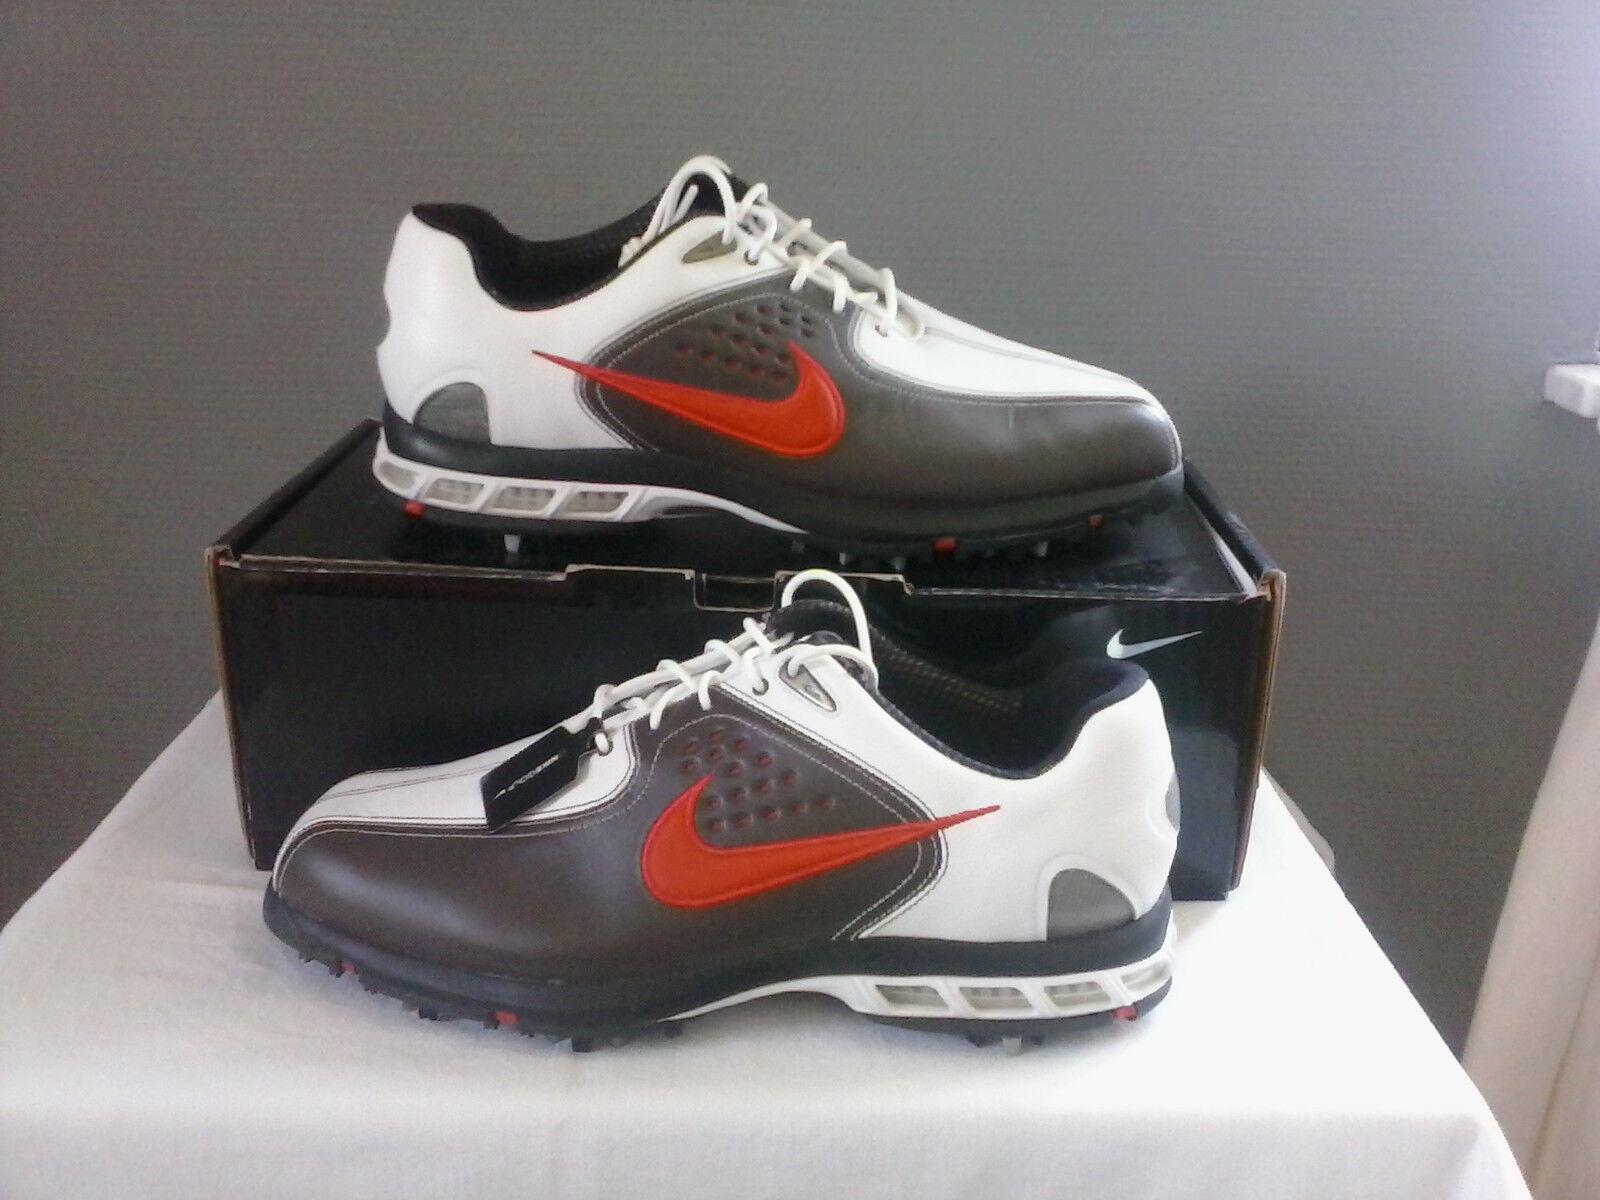 new style 316de 6dcb6 Nike Zoom Streak Spectrum Plus Supreme White White White Deadstock Size 12  0e1c92 ...